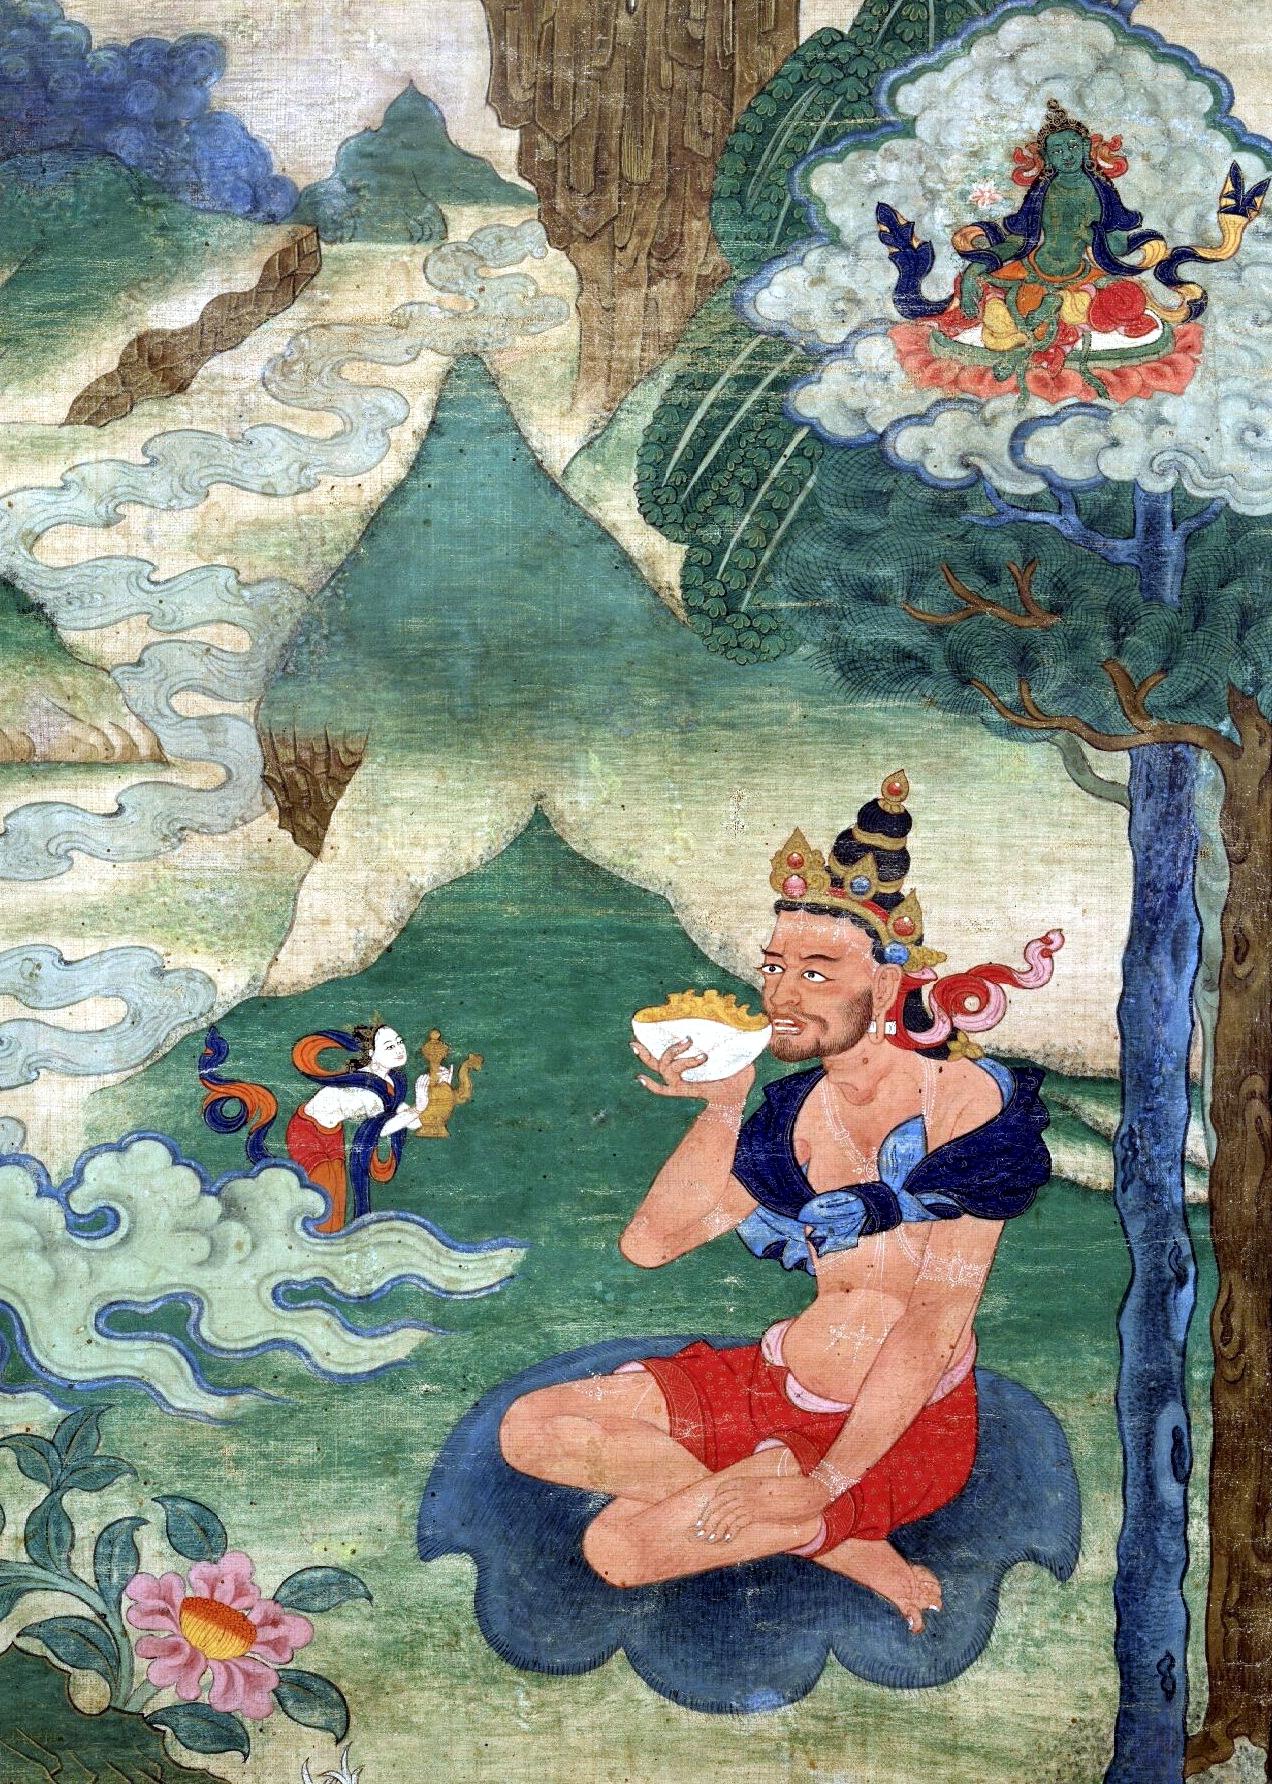 http://upload.wikimedia.org/wikipedia/commons/5/5b/Mahasiddha_Naropa.jpg